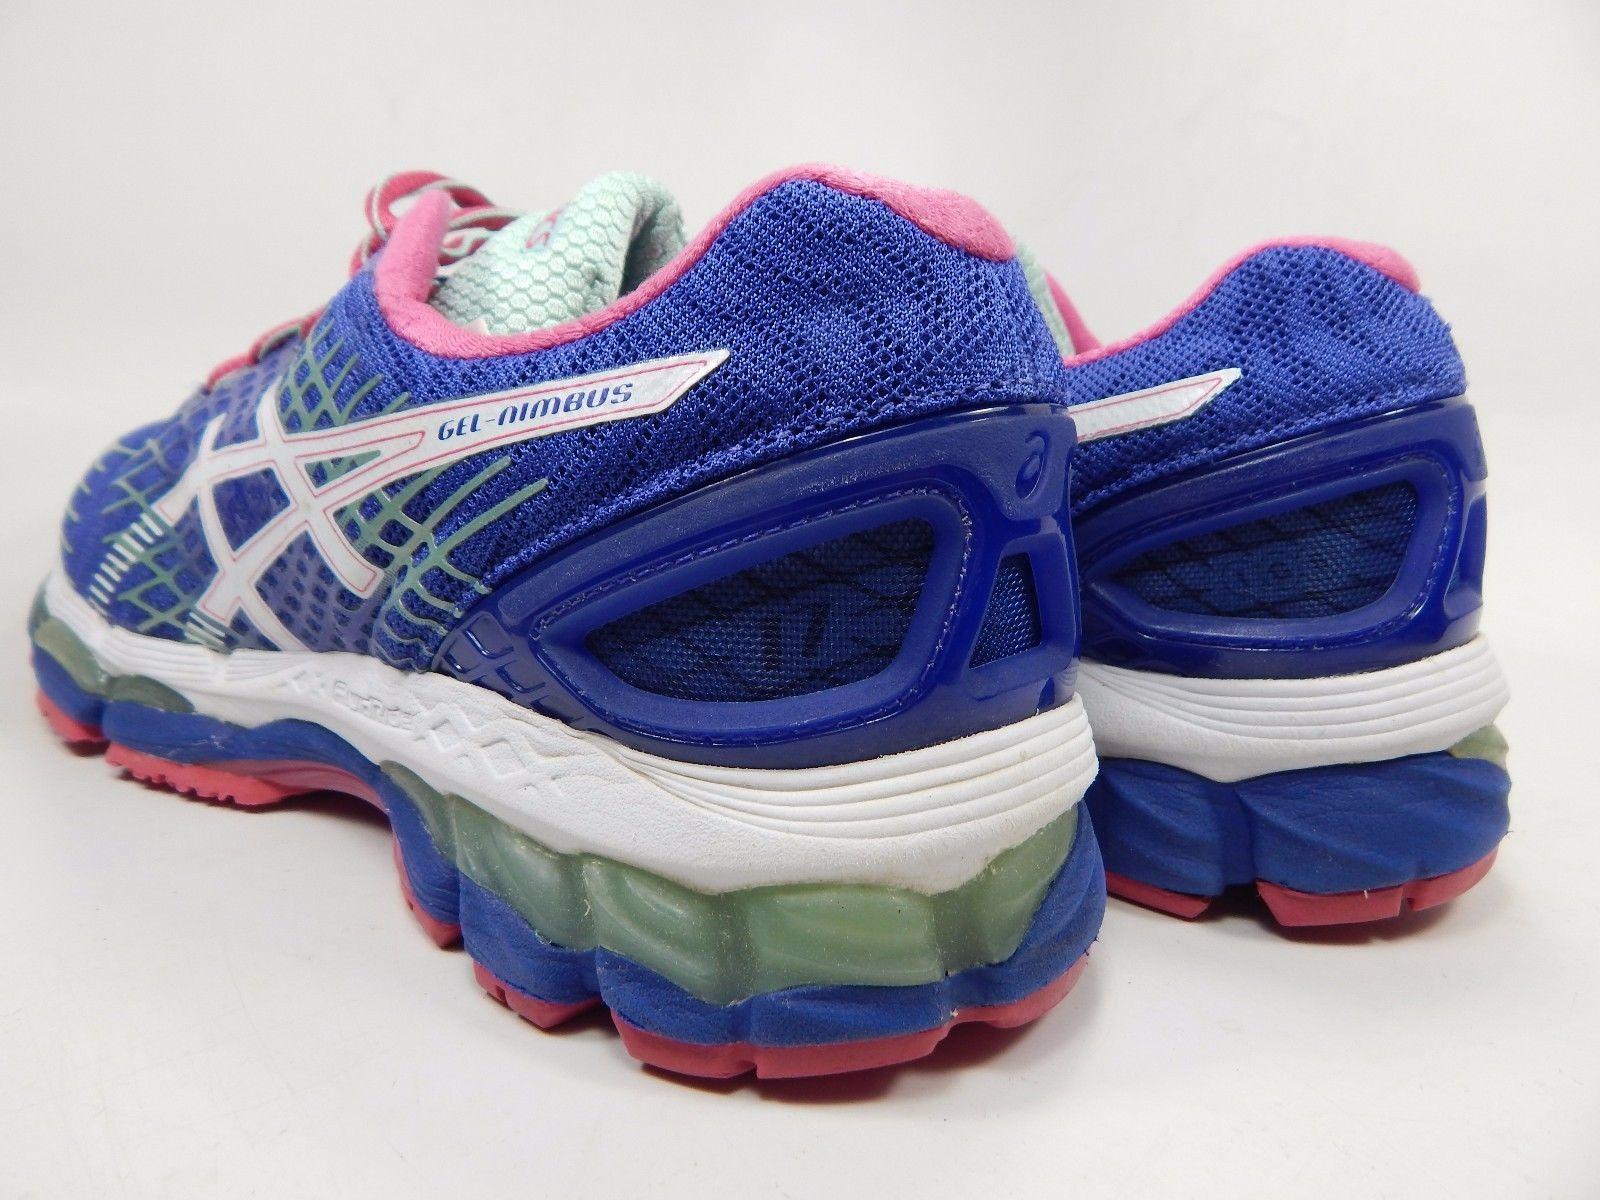 Asics Gel Nimbus 17 Women's Running Shoes Size US 8.5 M (B) EU 40 Blue Pink